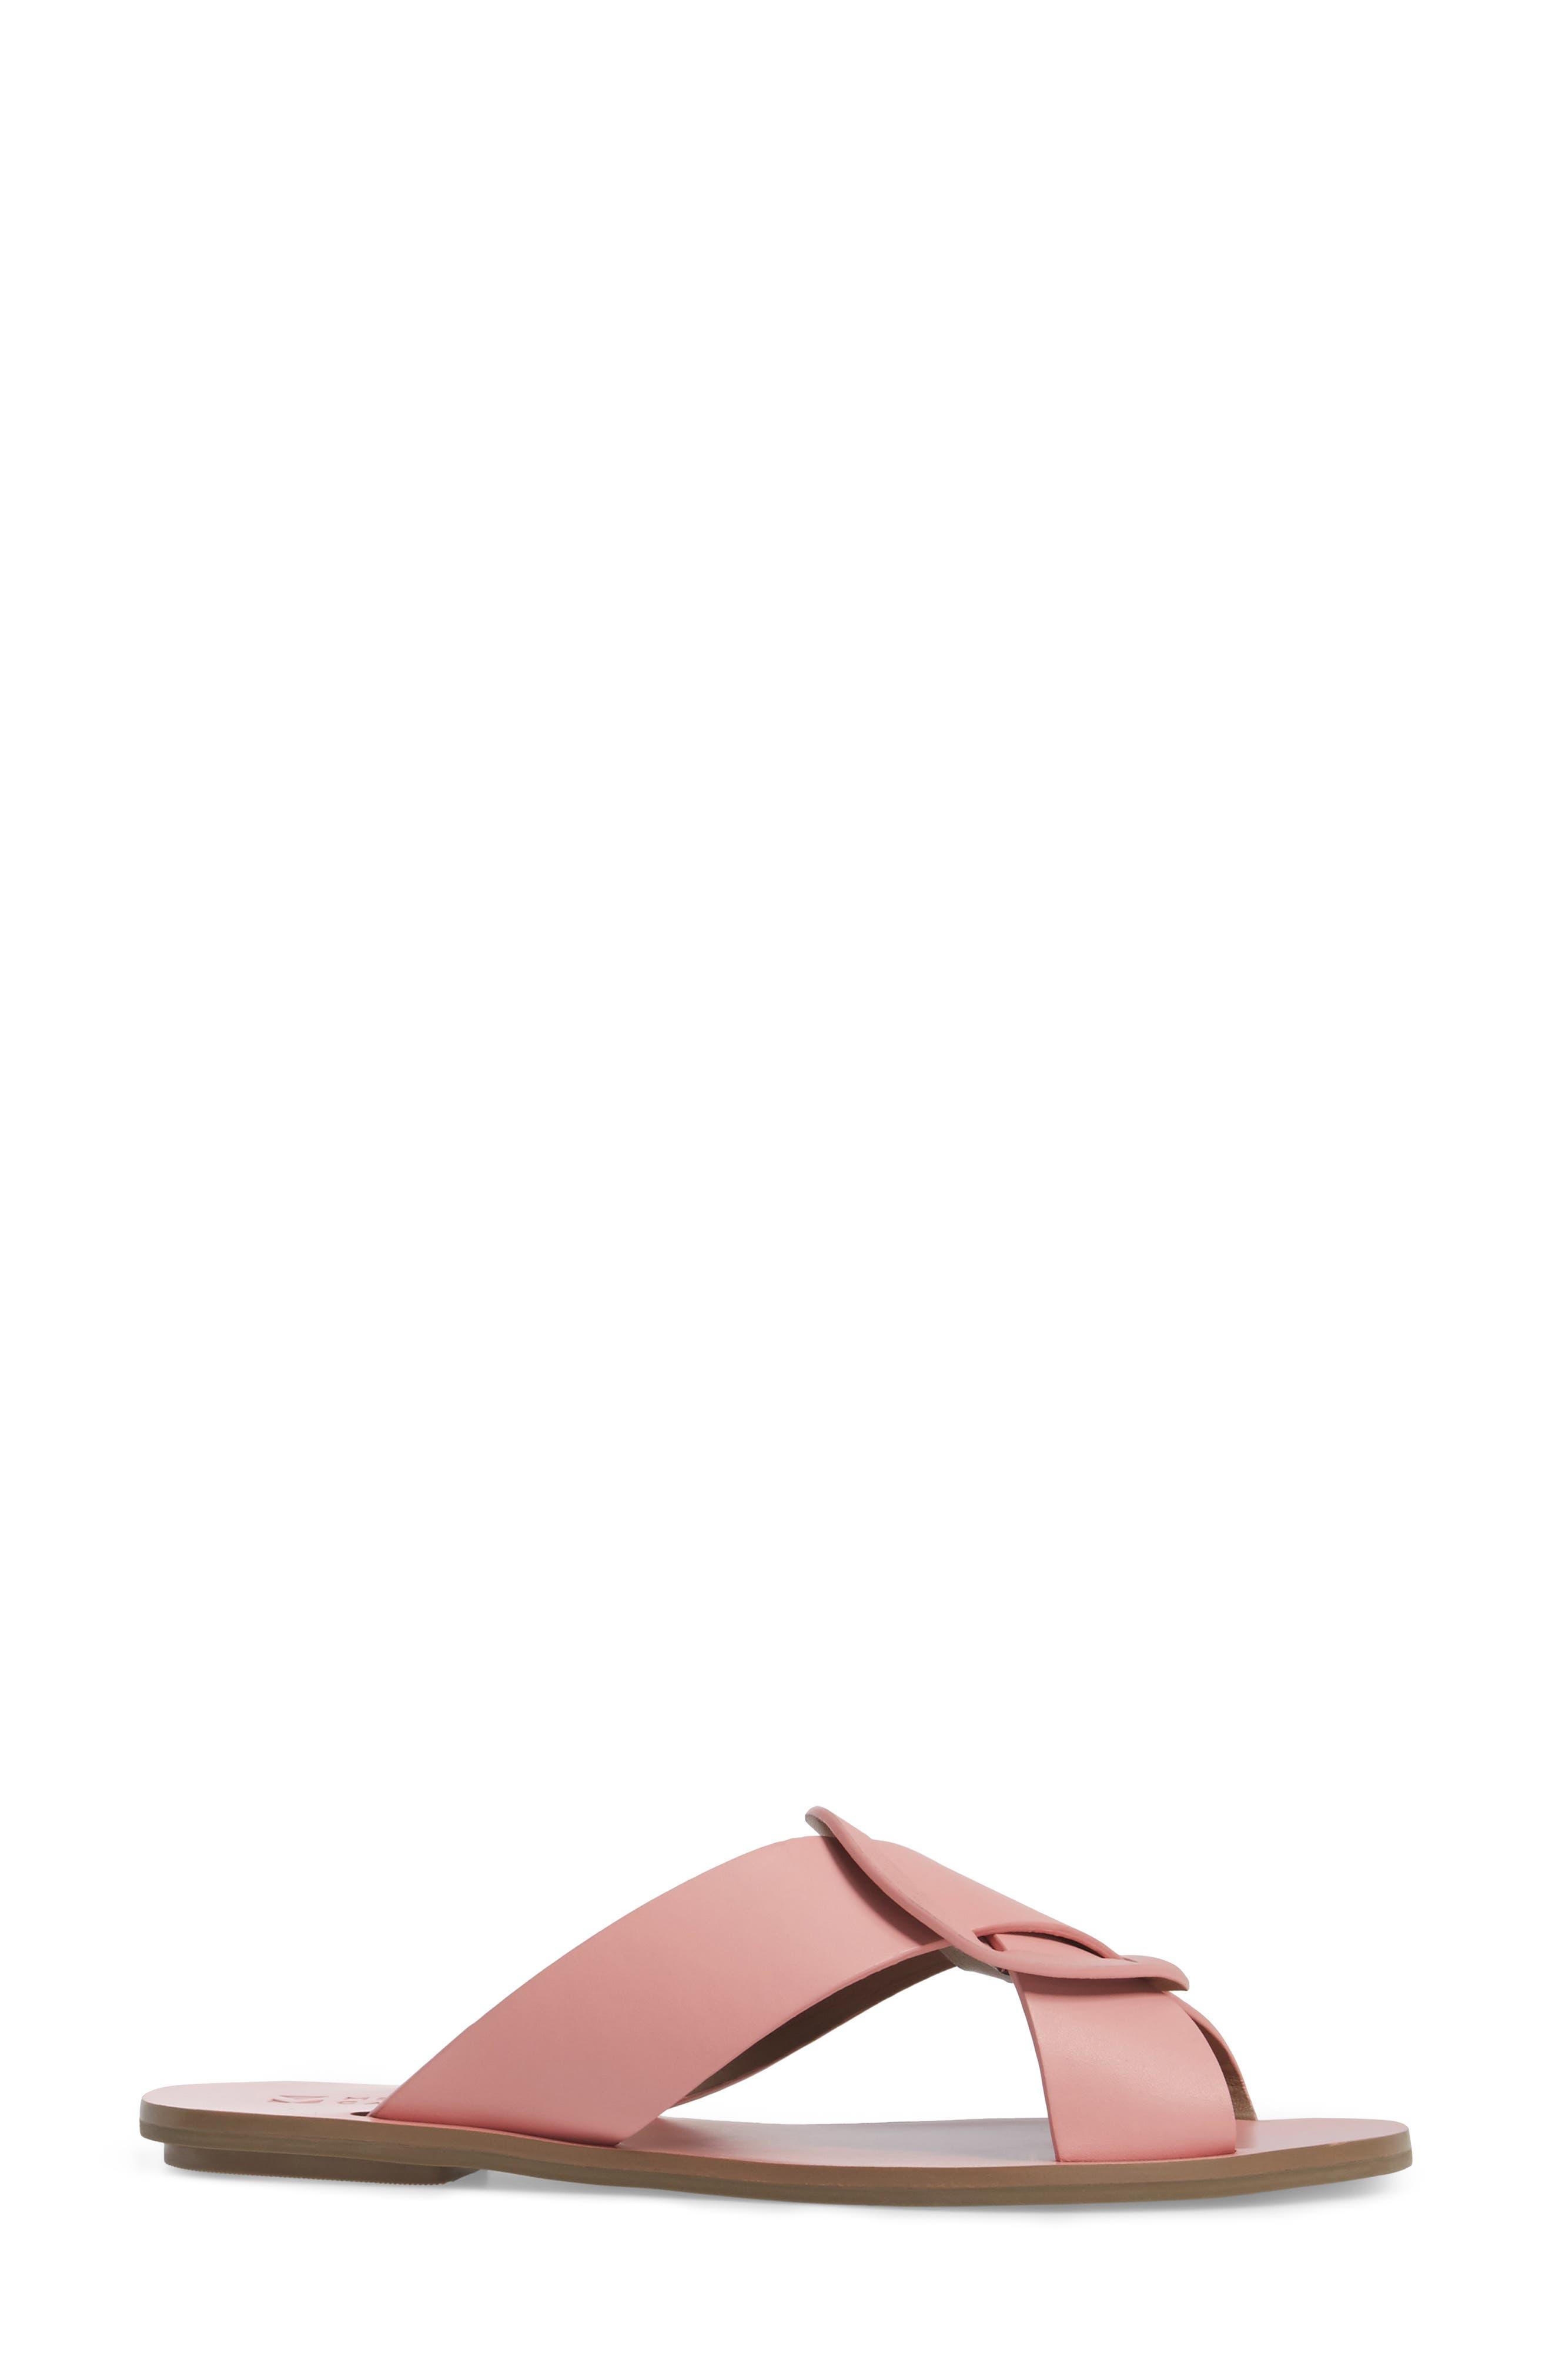 Carlein Slide Sandal,                             Alternate thumbnail 4, color,                             Pink Peony Leather